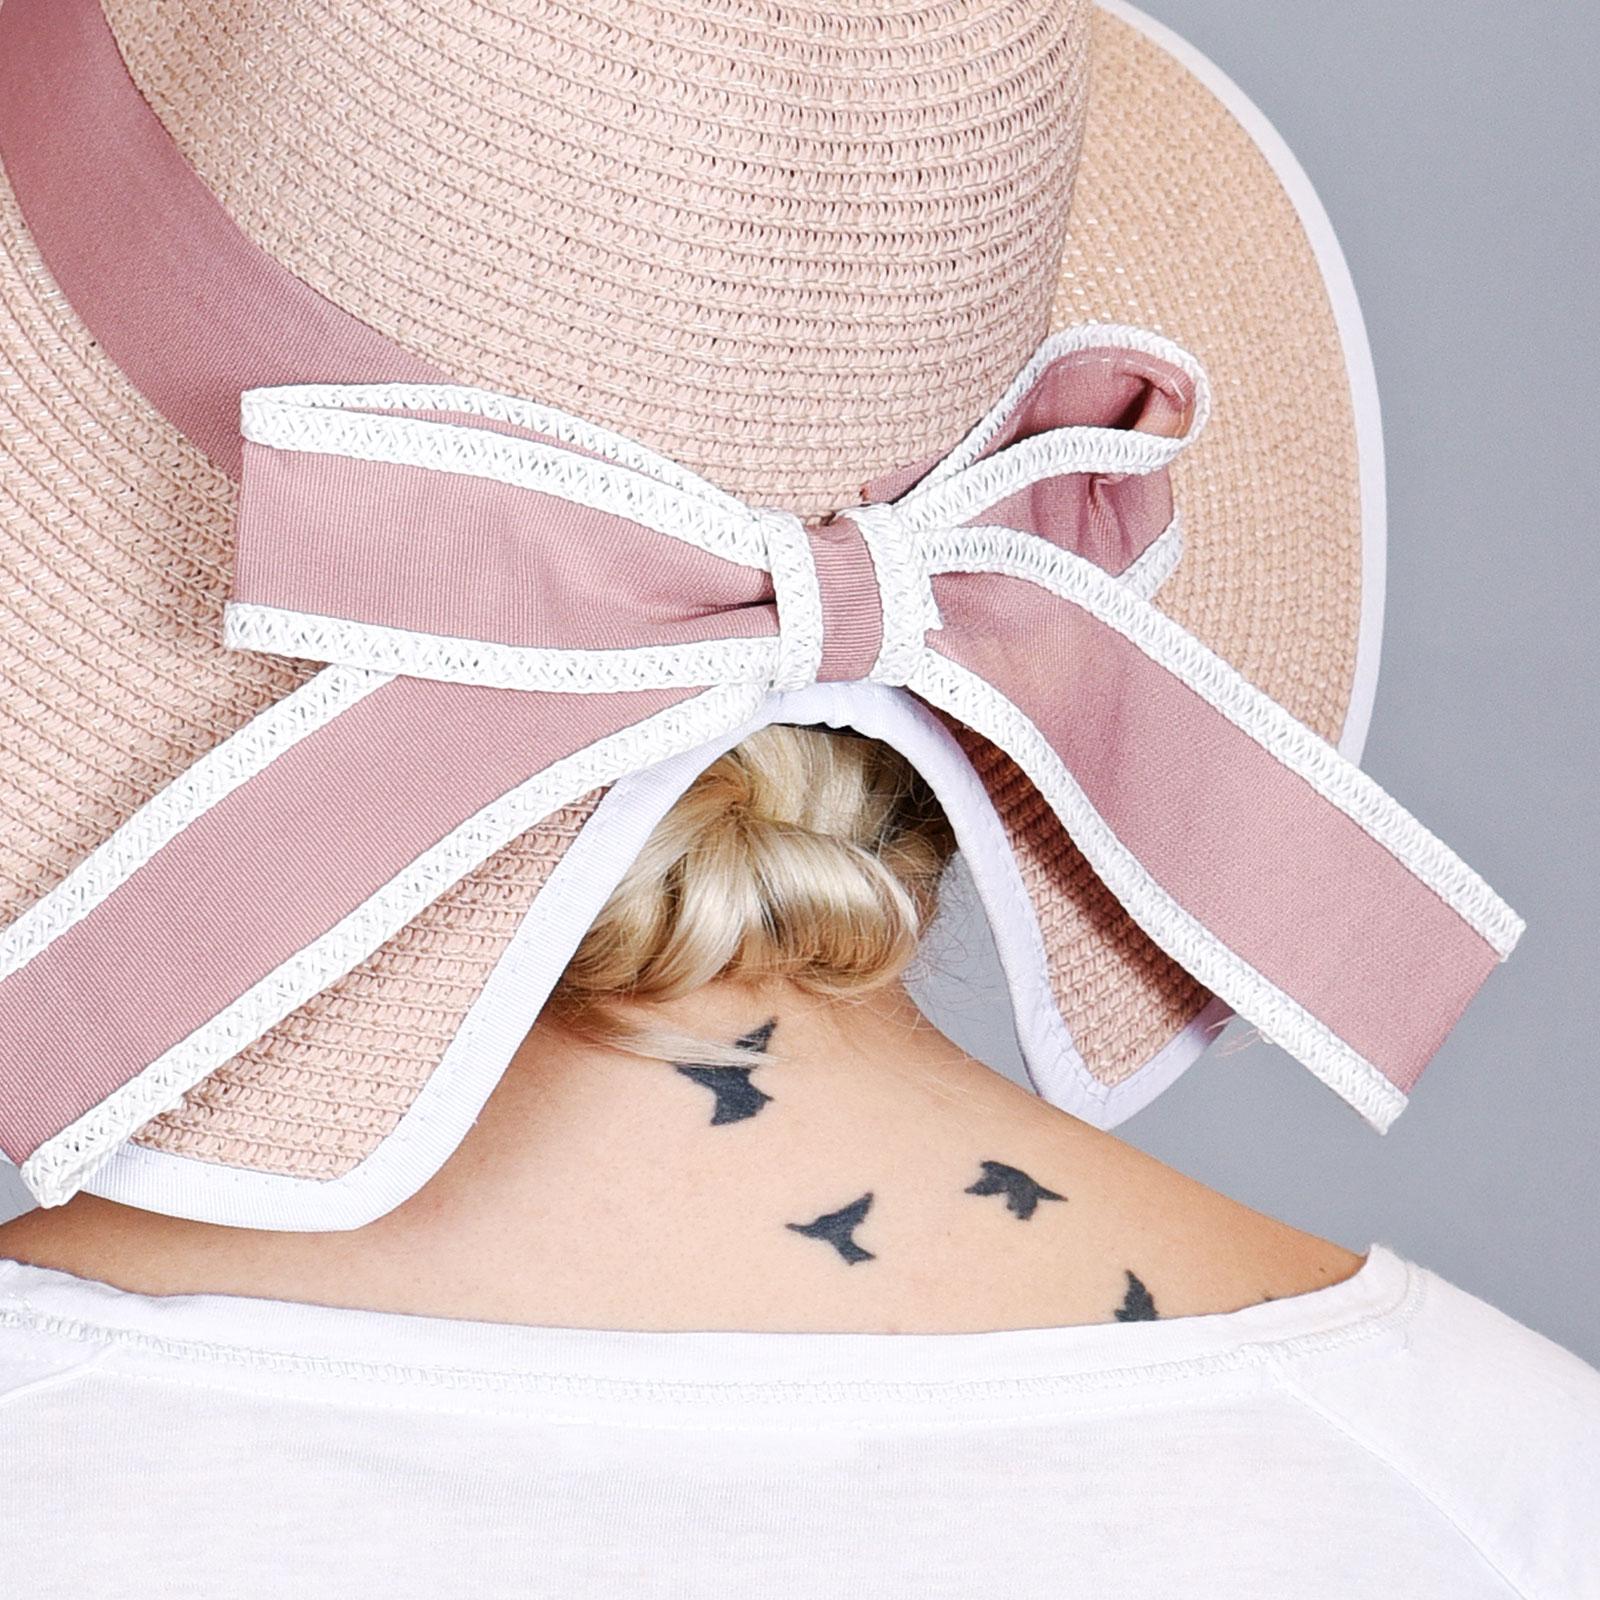 CP-00896-VF16-2-chapeau-capeline-femme-ruban-rose